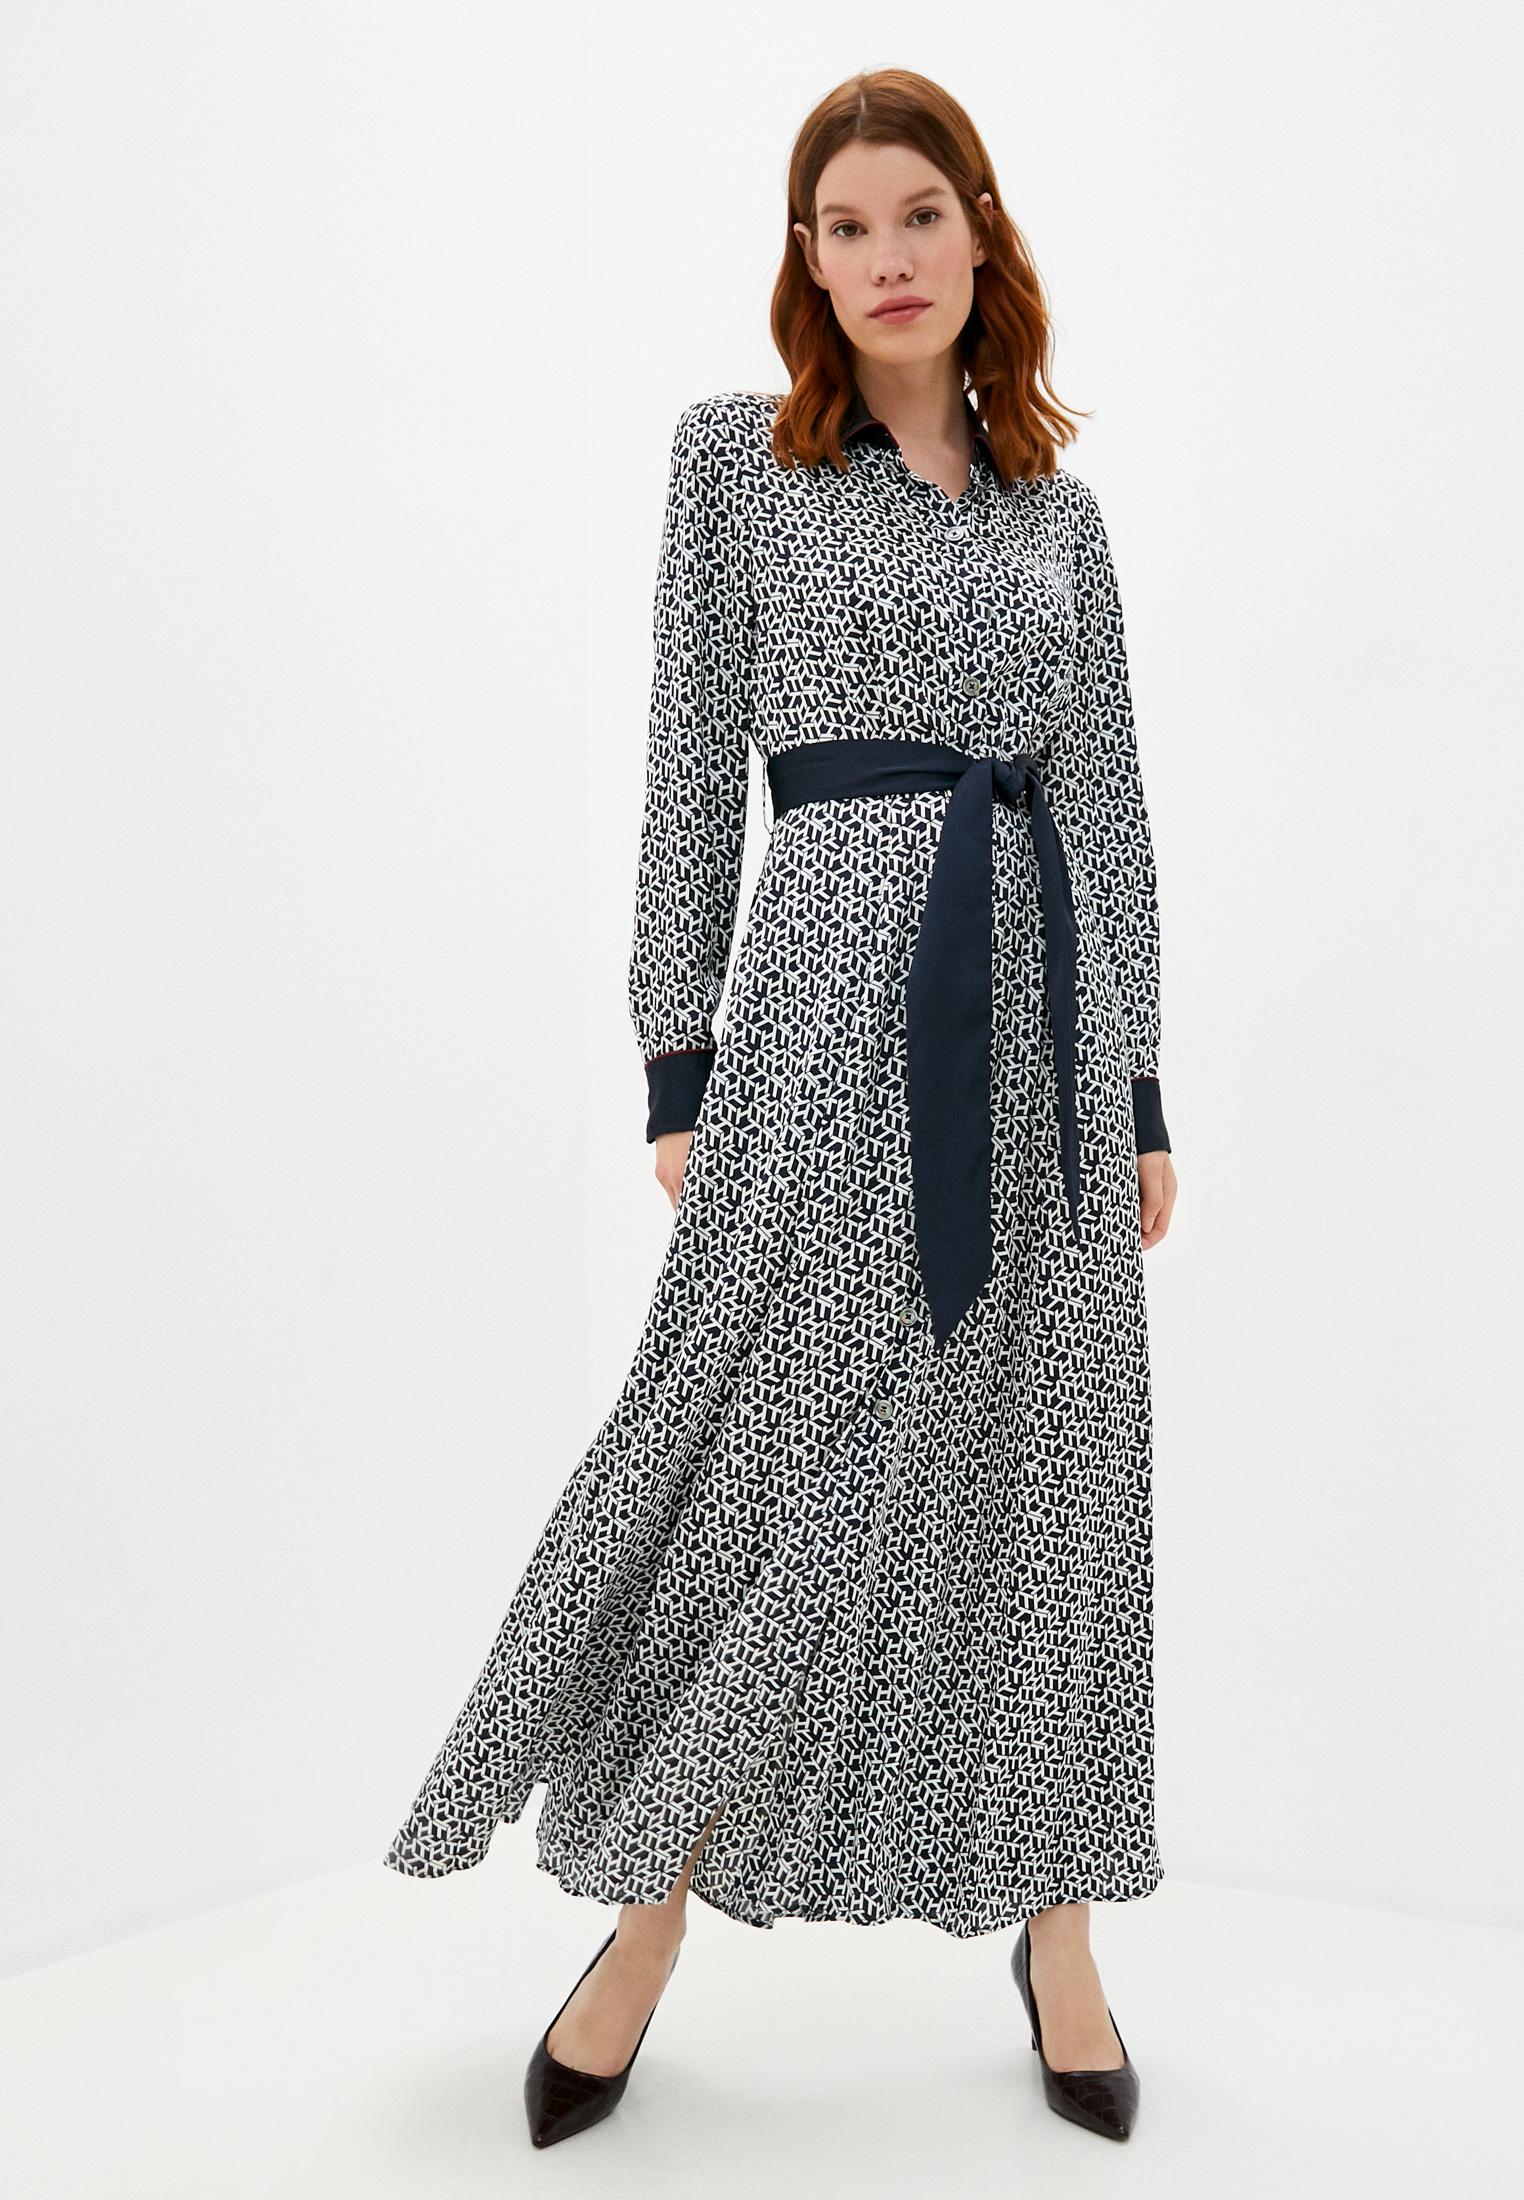 Платье Tommy Hilfiger (Томми Хилфигер) WW0WW28523